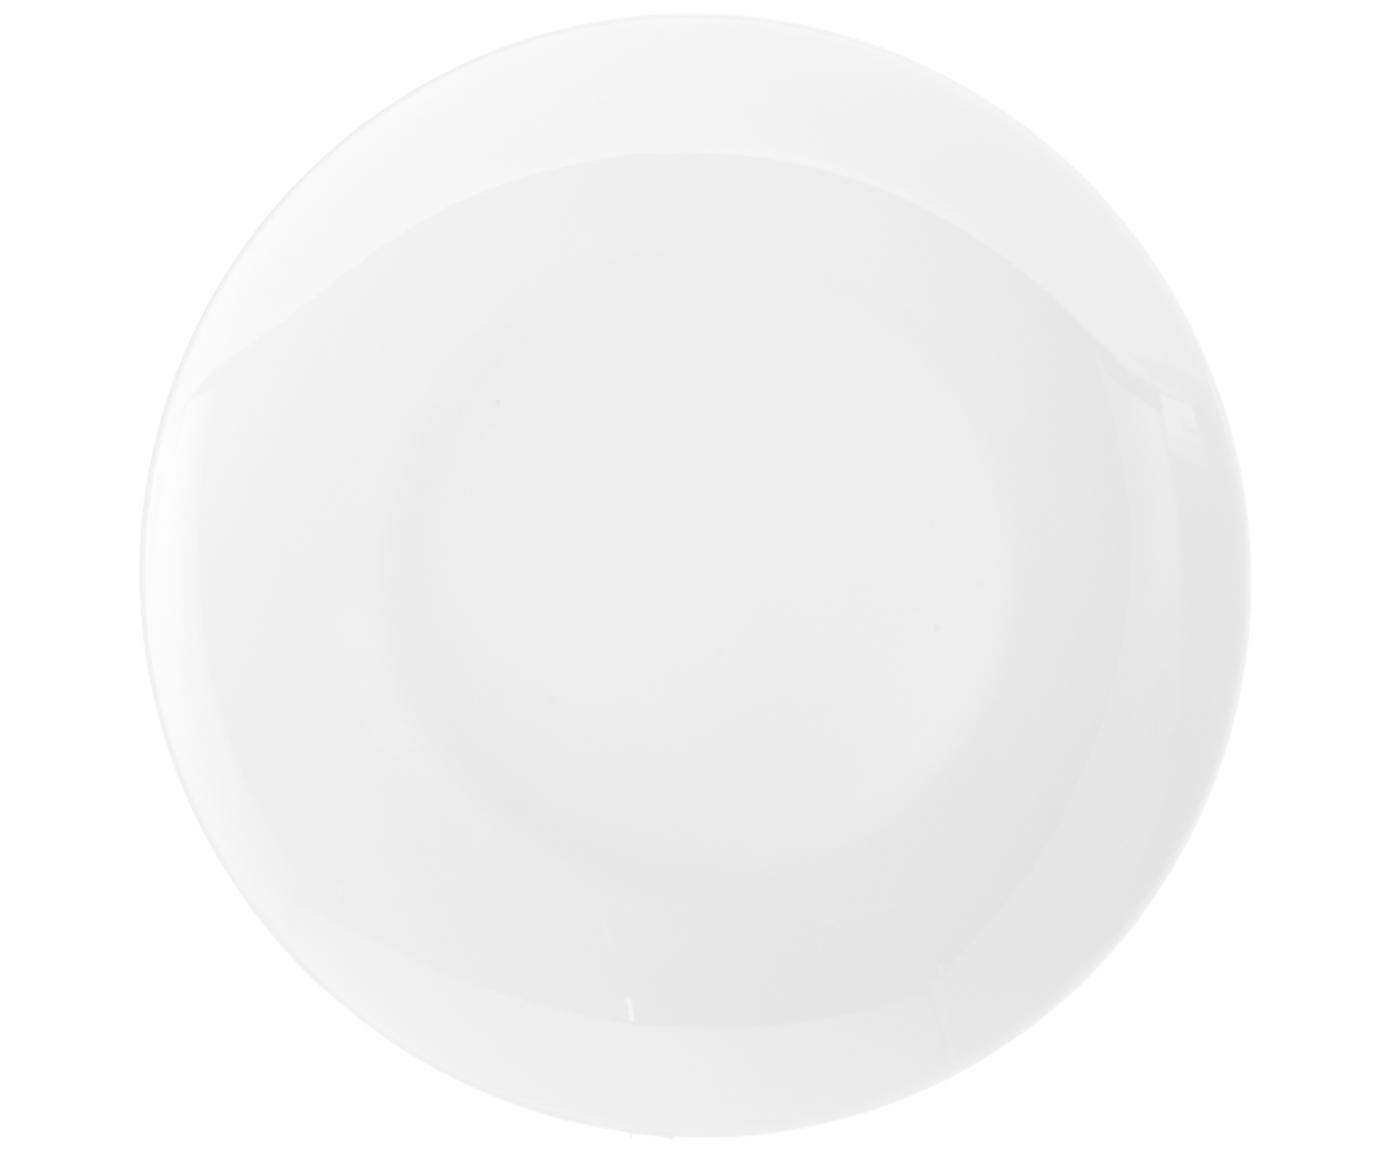 Dinerborden Delight Modern, 2 stuks, Porselein, Wit, Ø 27 cm